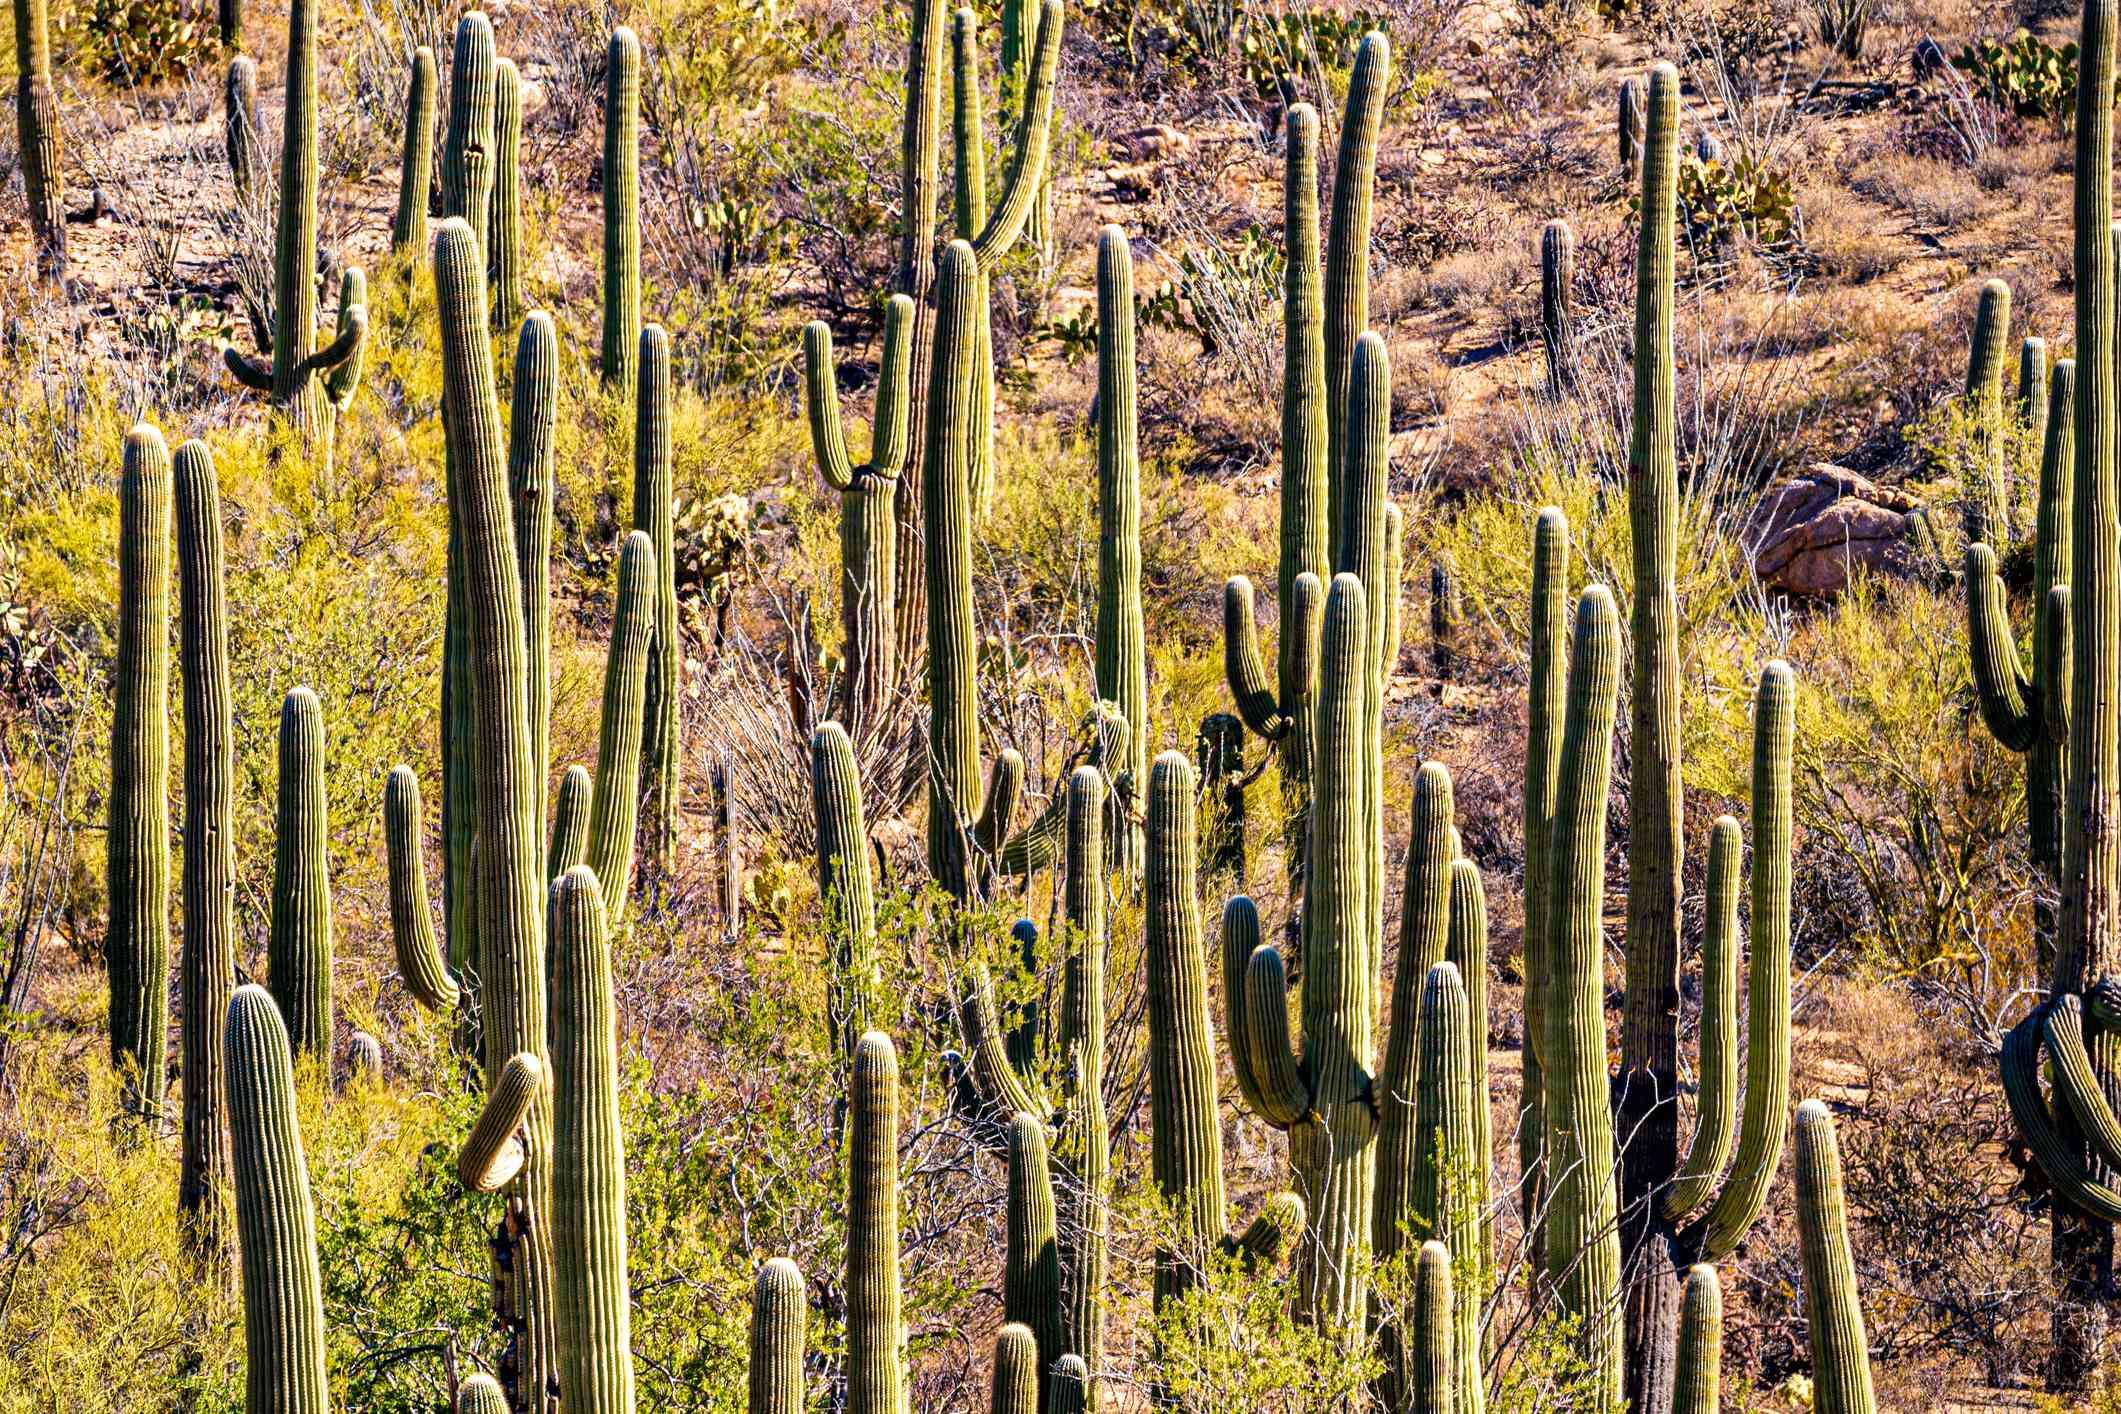 Saguaros in Saguaro National Park